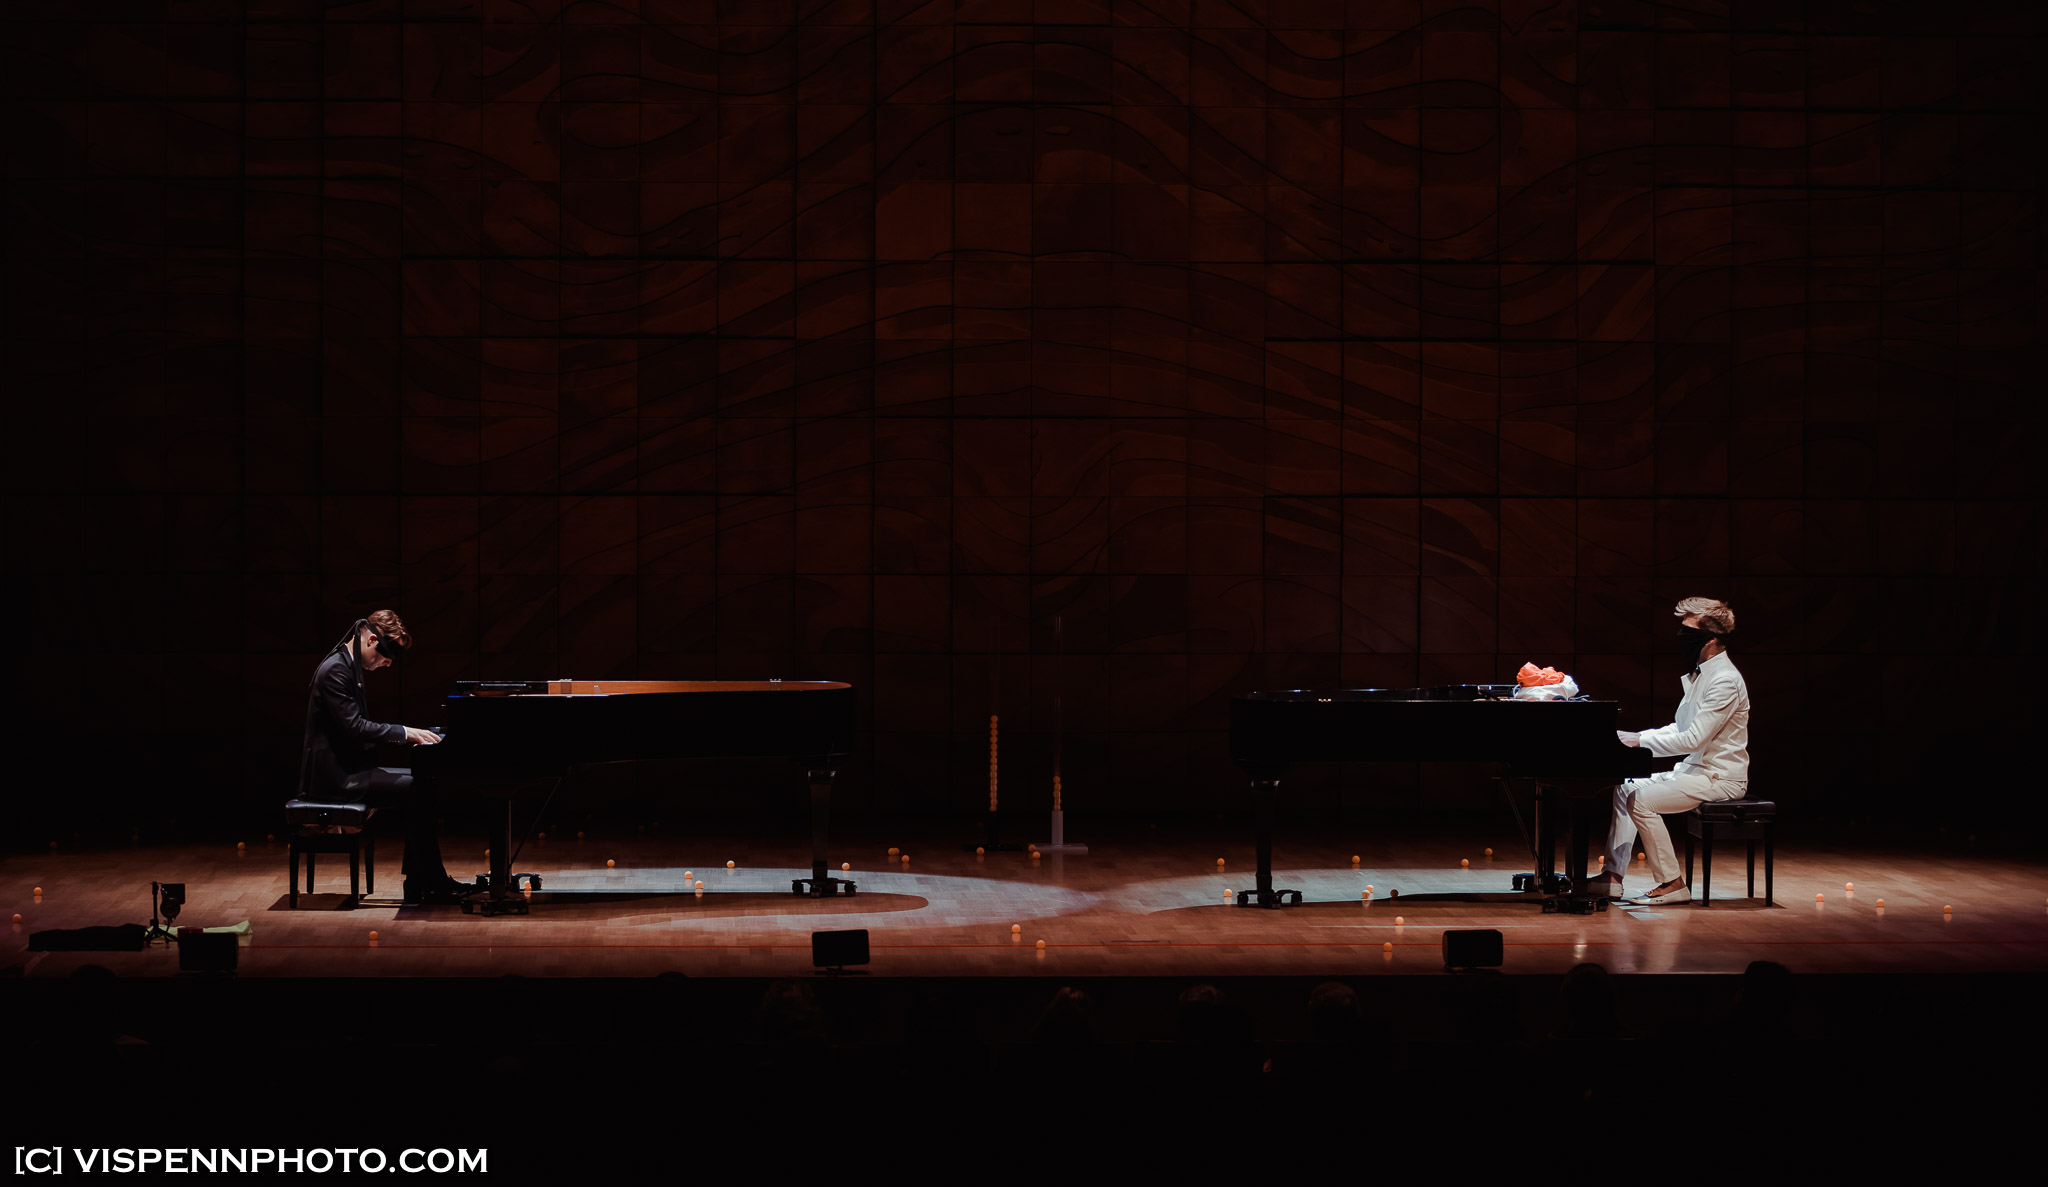 Melbourne CONCERTS Photography 墨尔本 演唱会 照片 摄影师 VISPENN PianoBattle 2P 3493 5D4 VISPENN